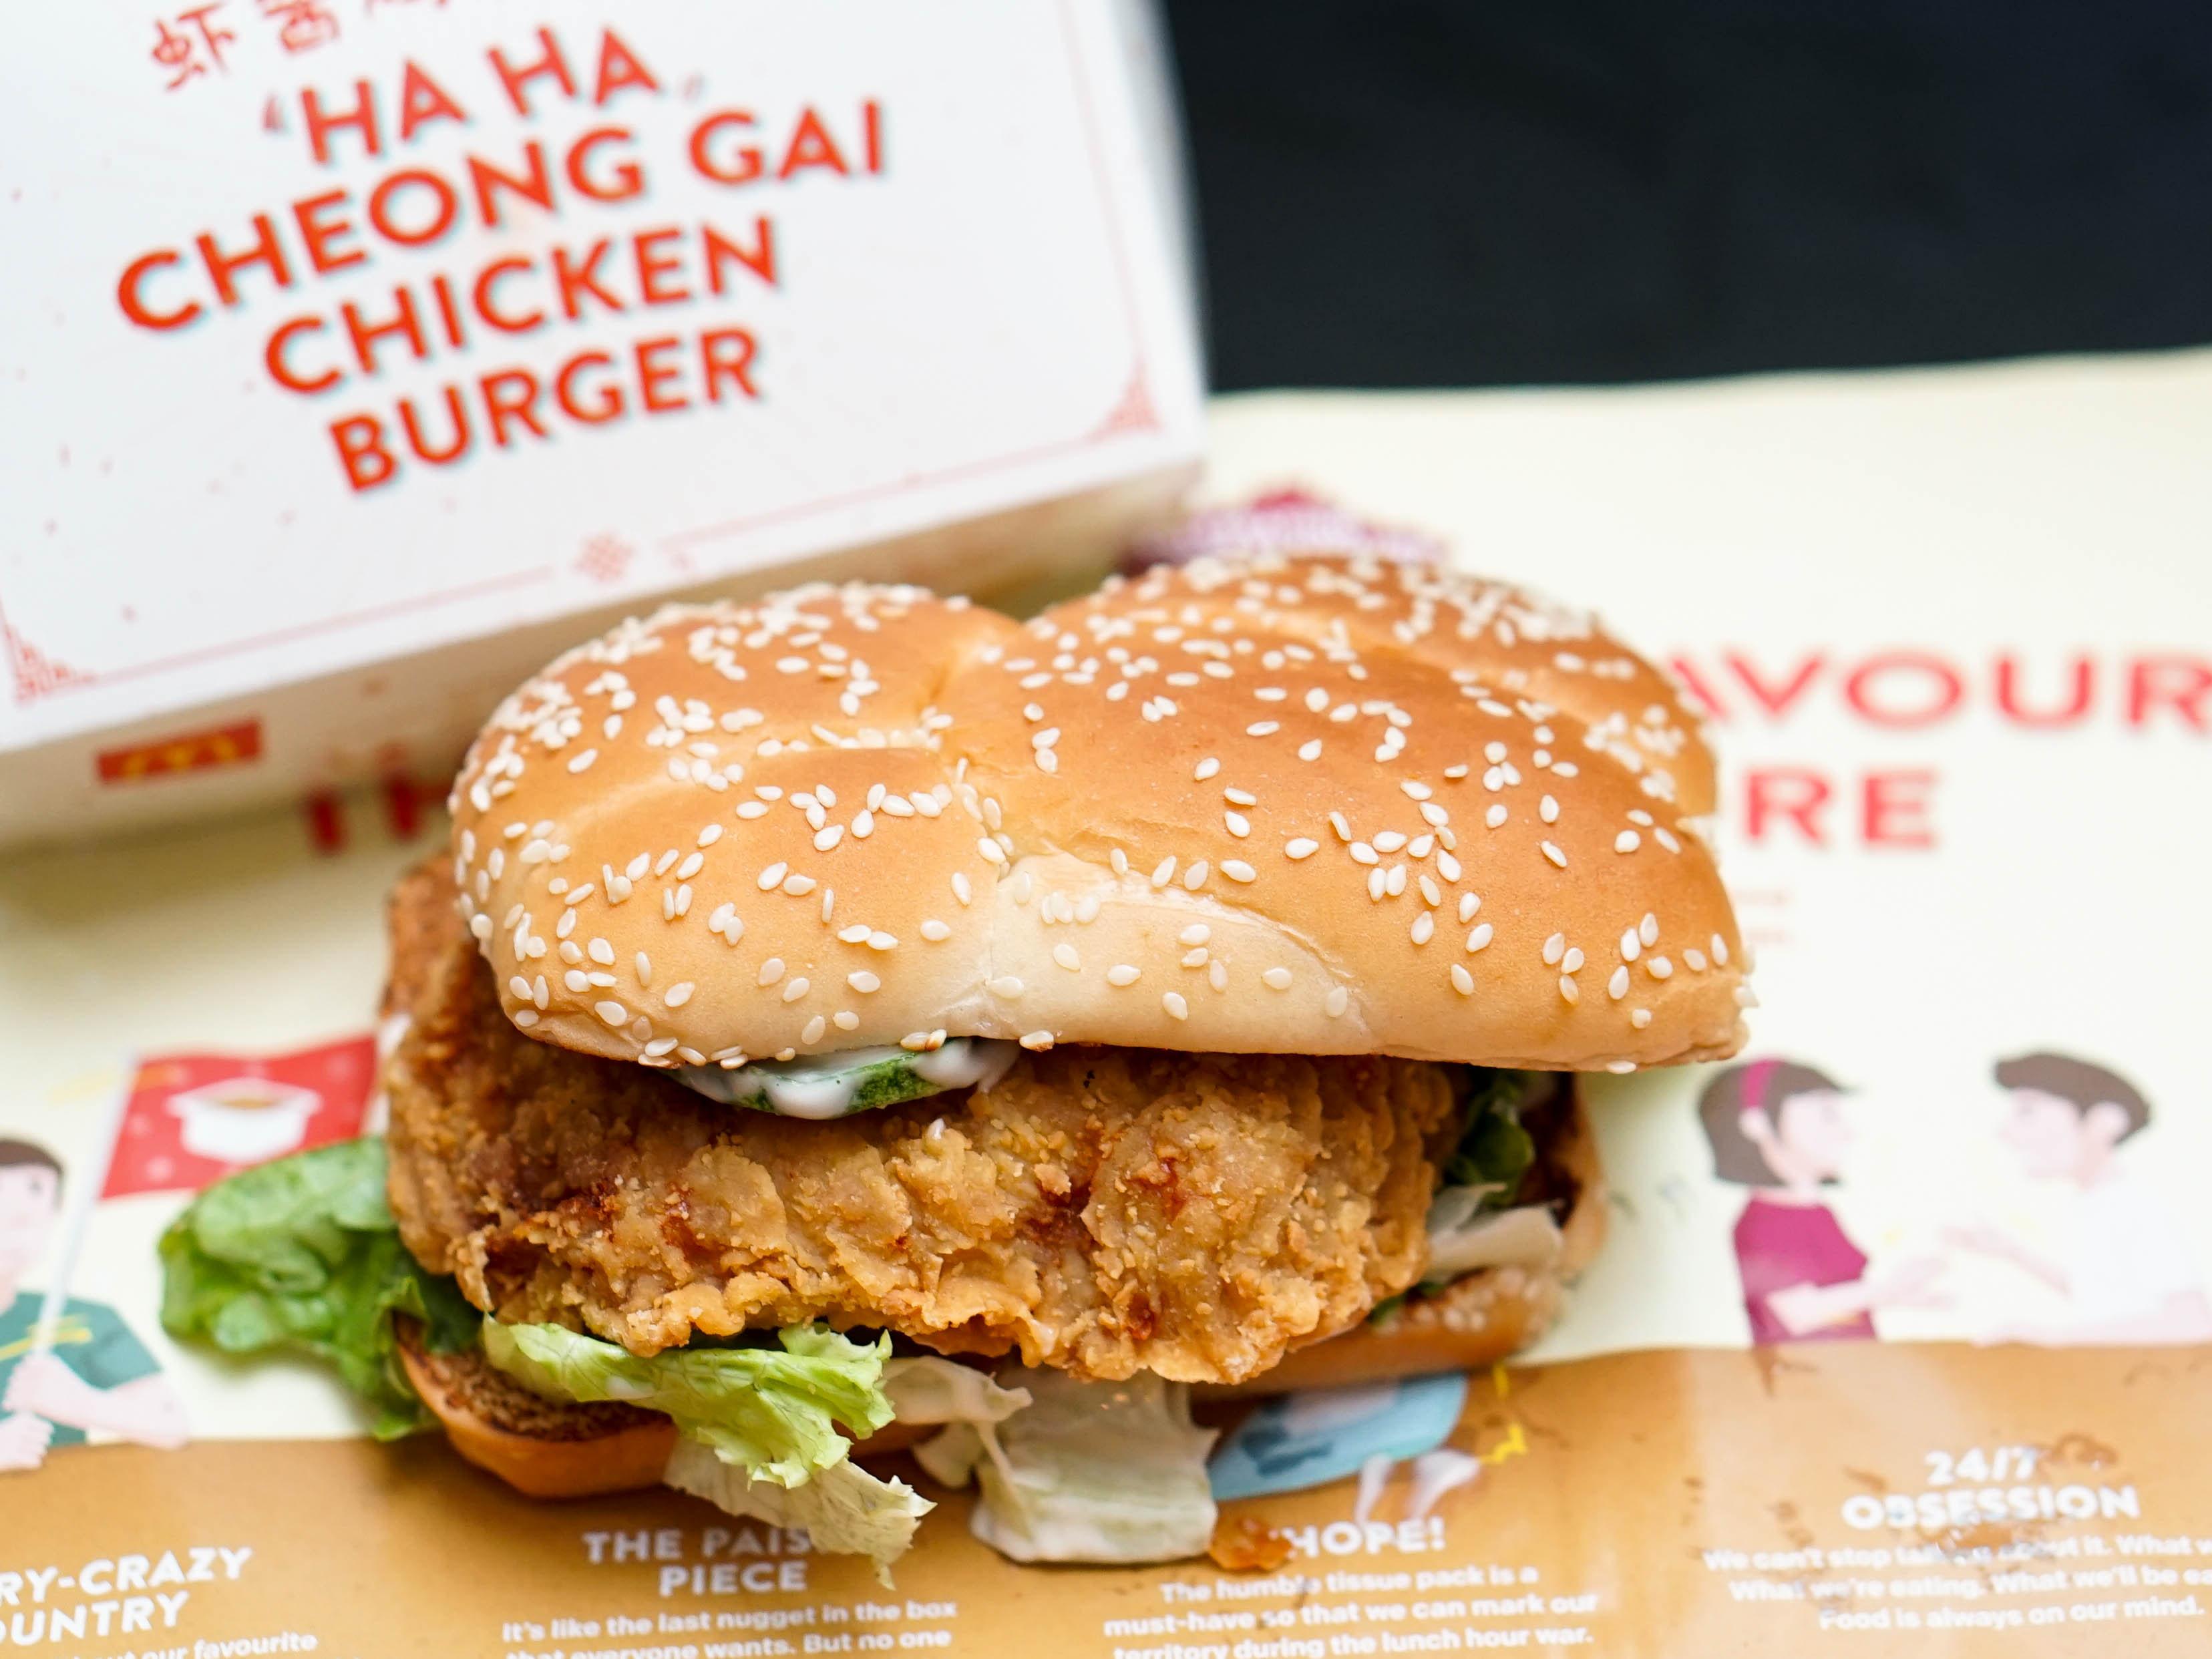 har cheong gai burger